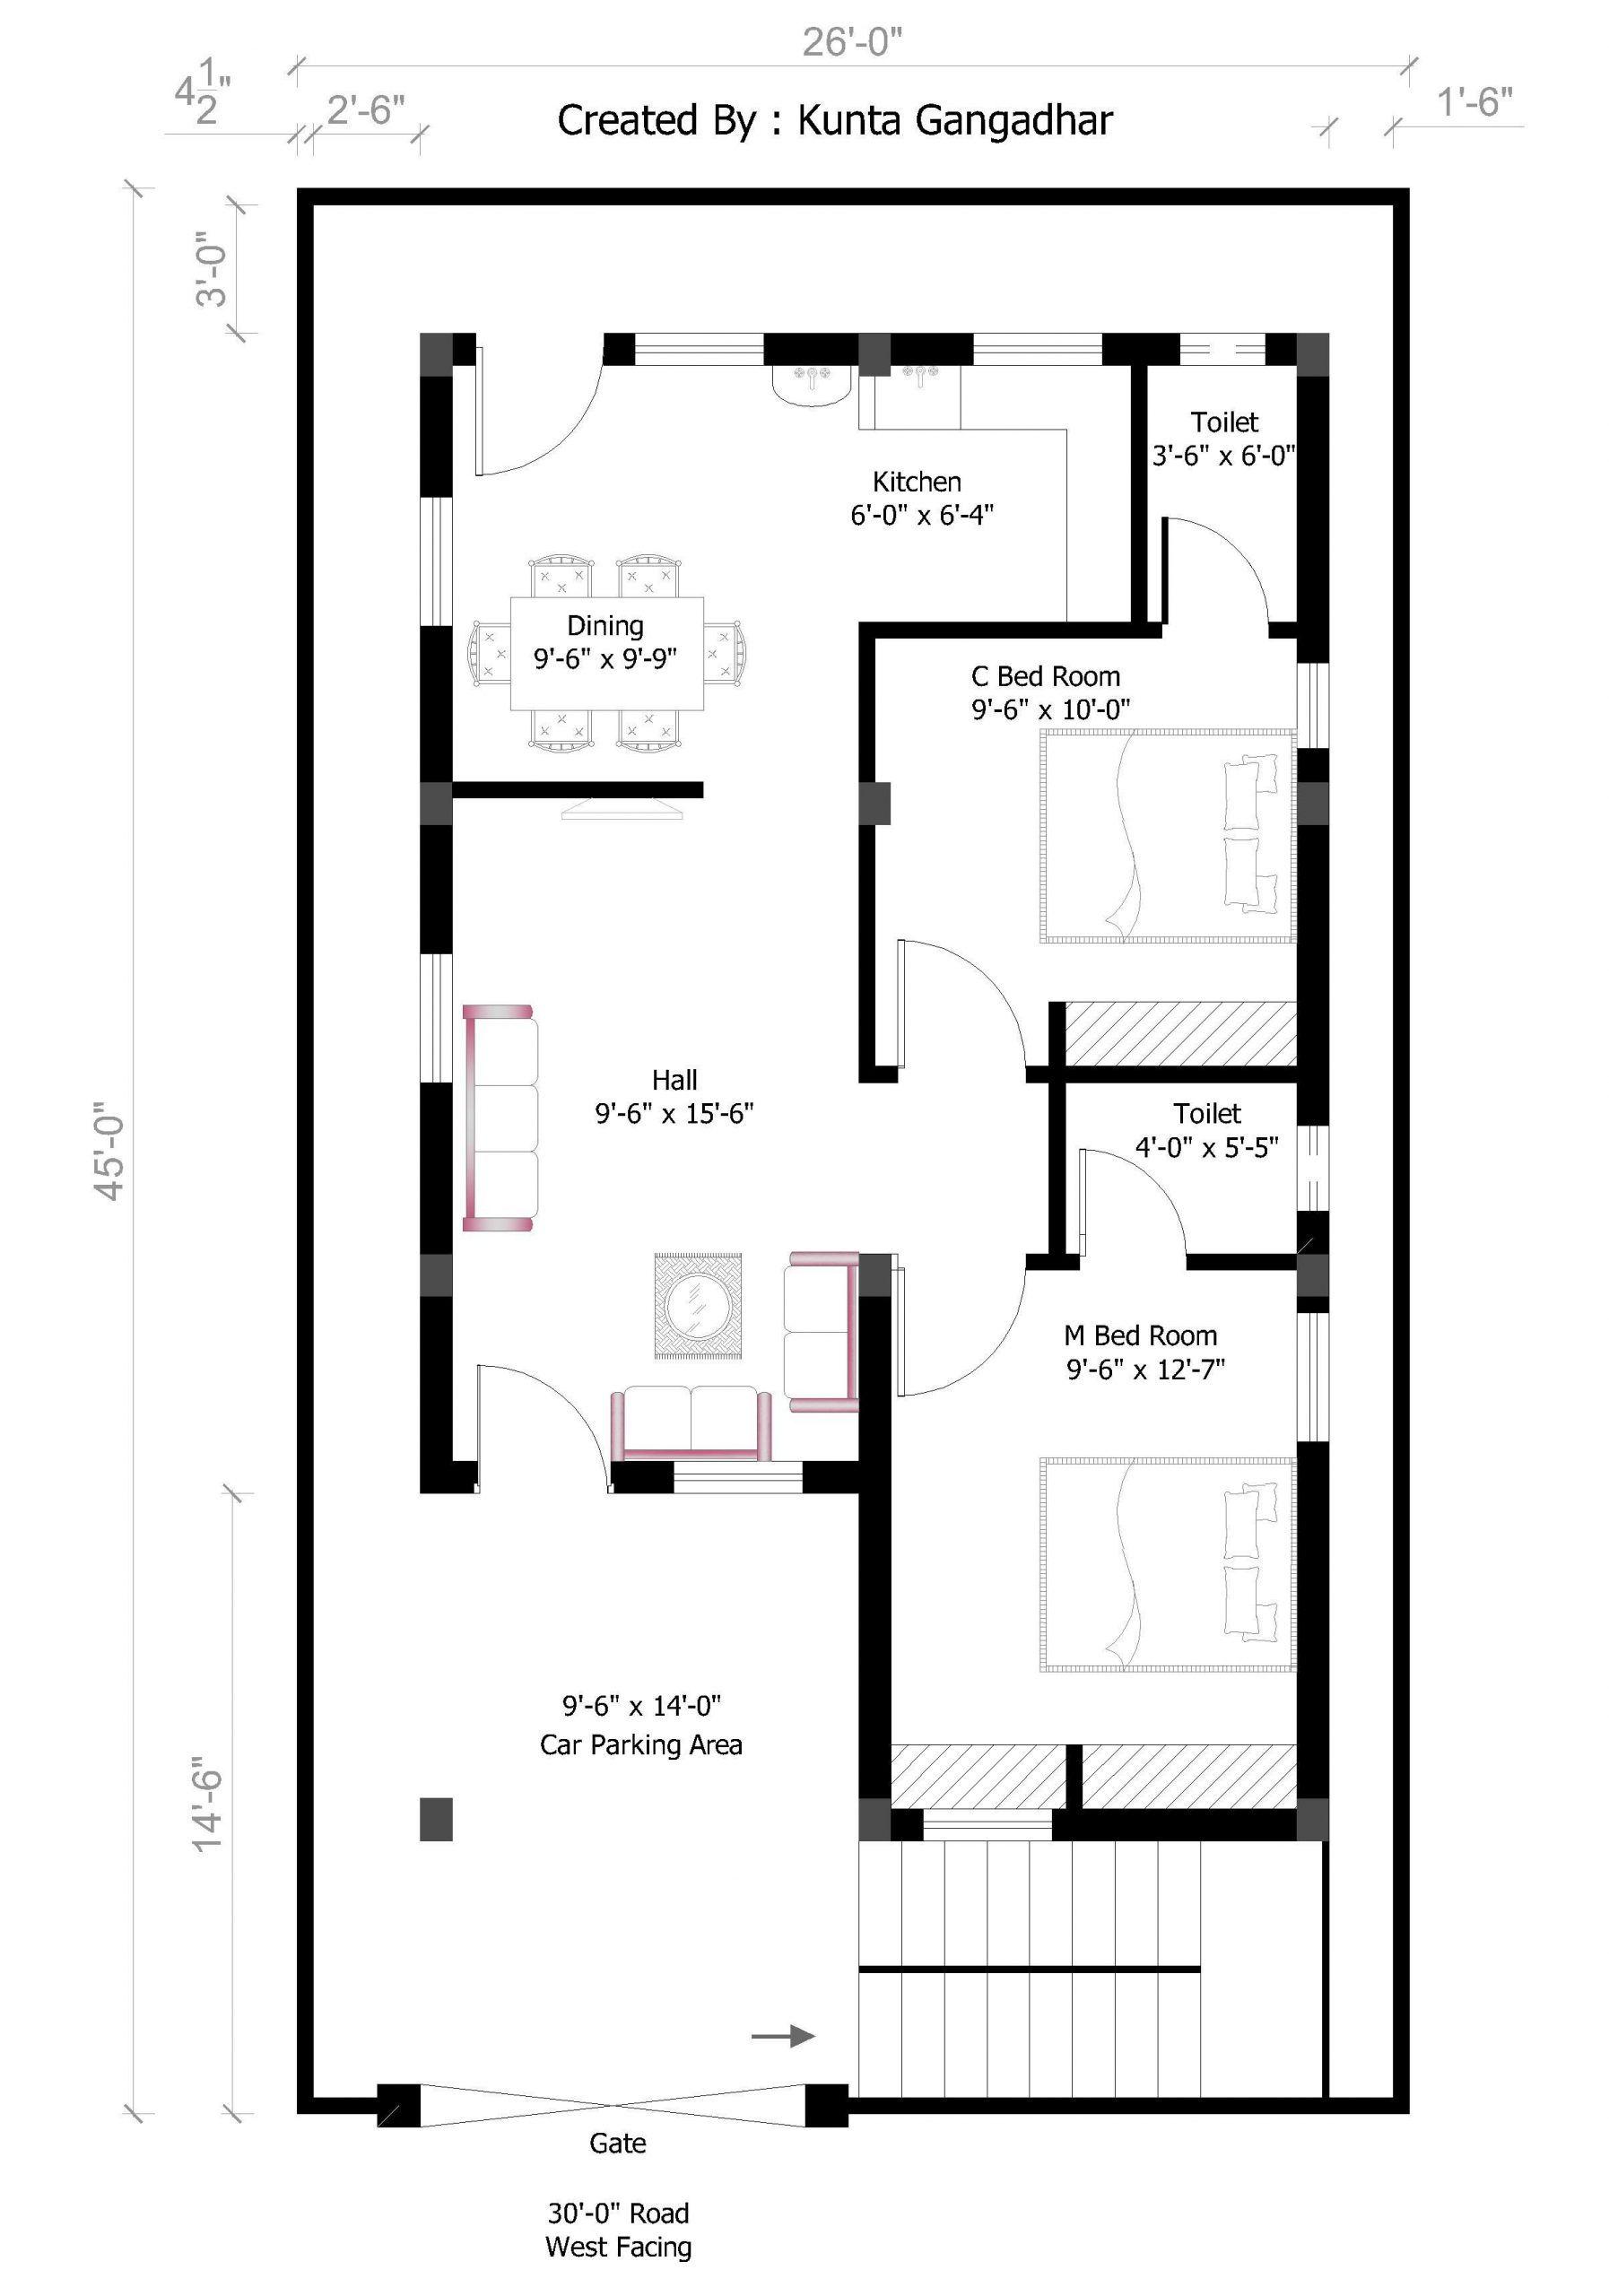 Model House Plans Free 2021 Model House Plan 2bhk House Plan 10 Marla House Plan